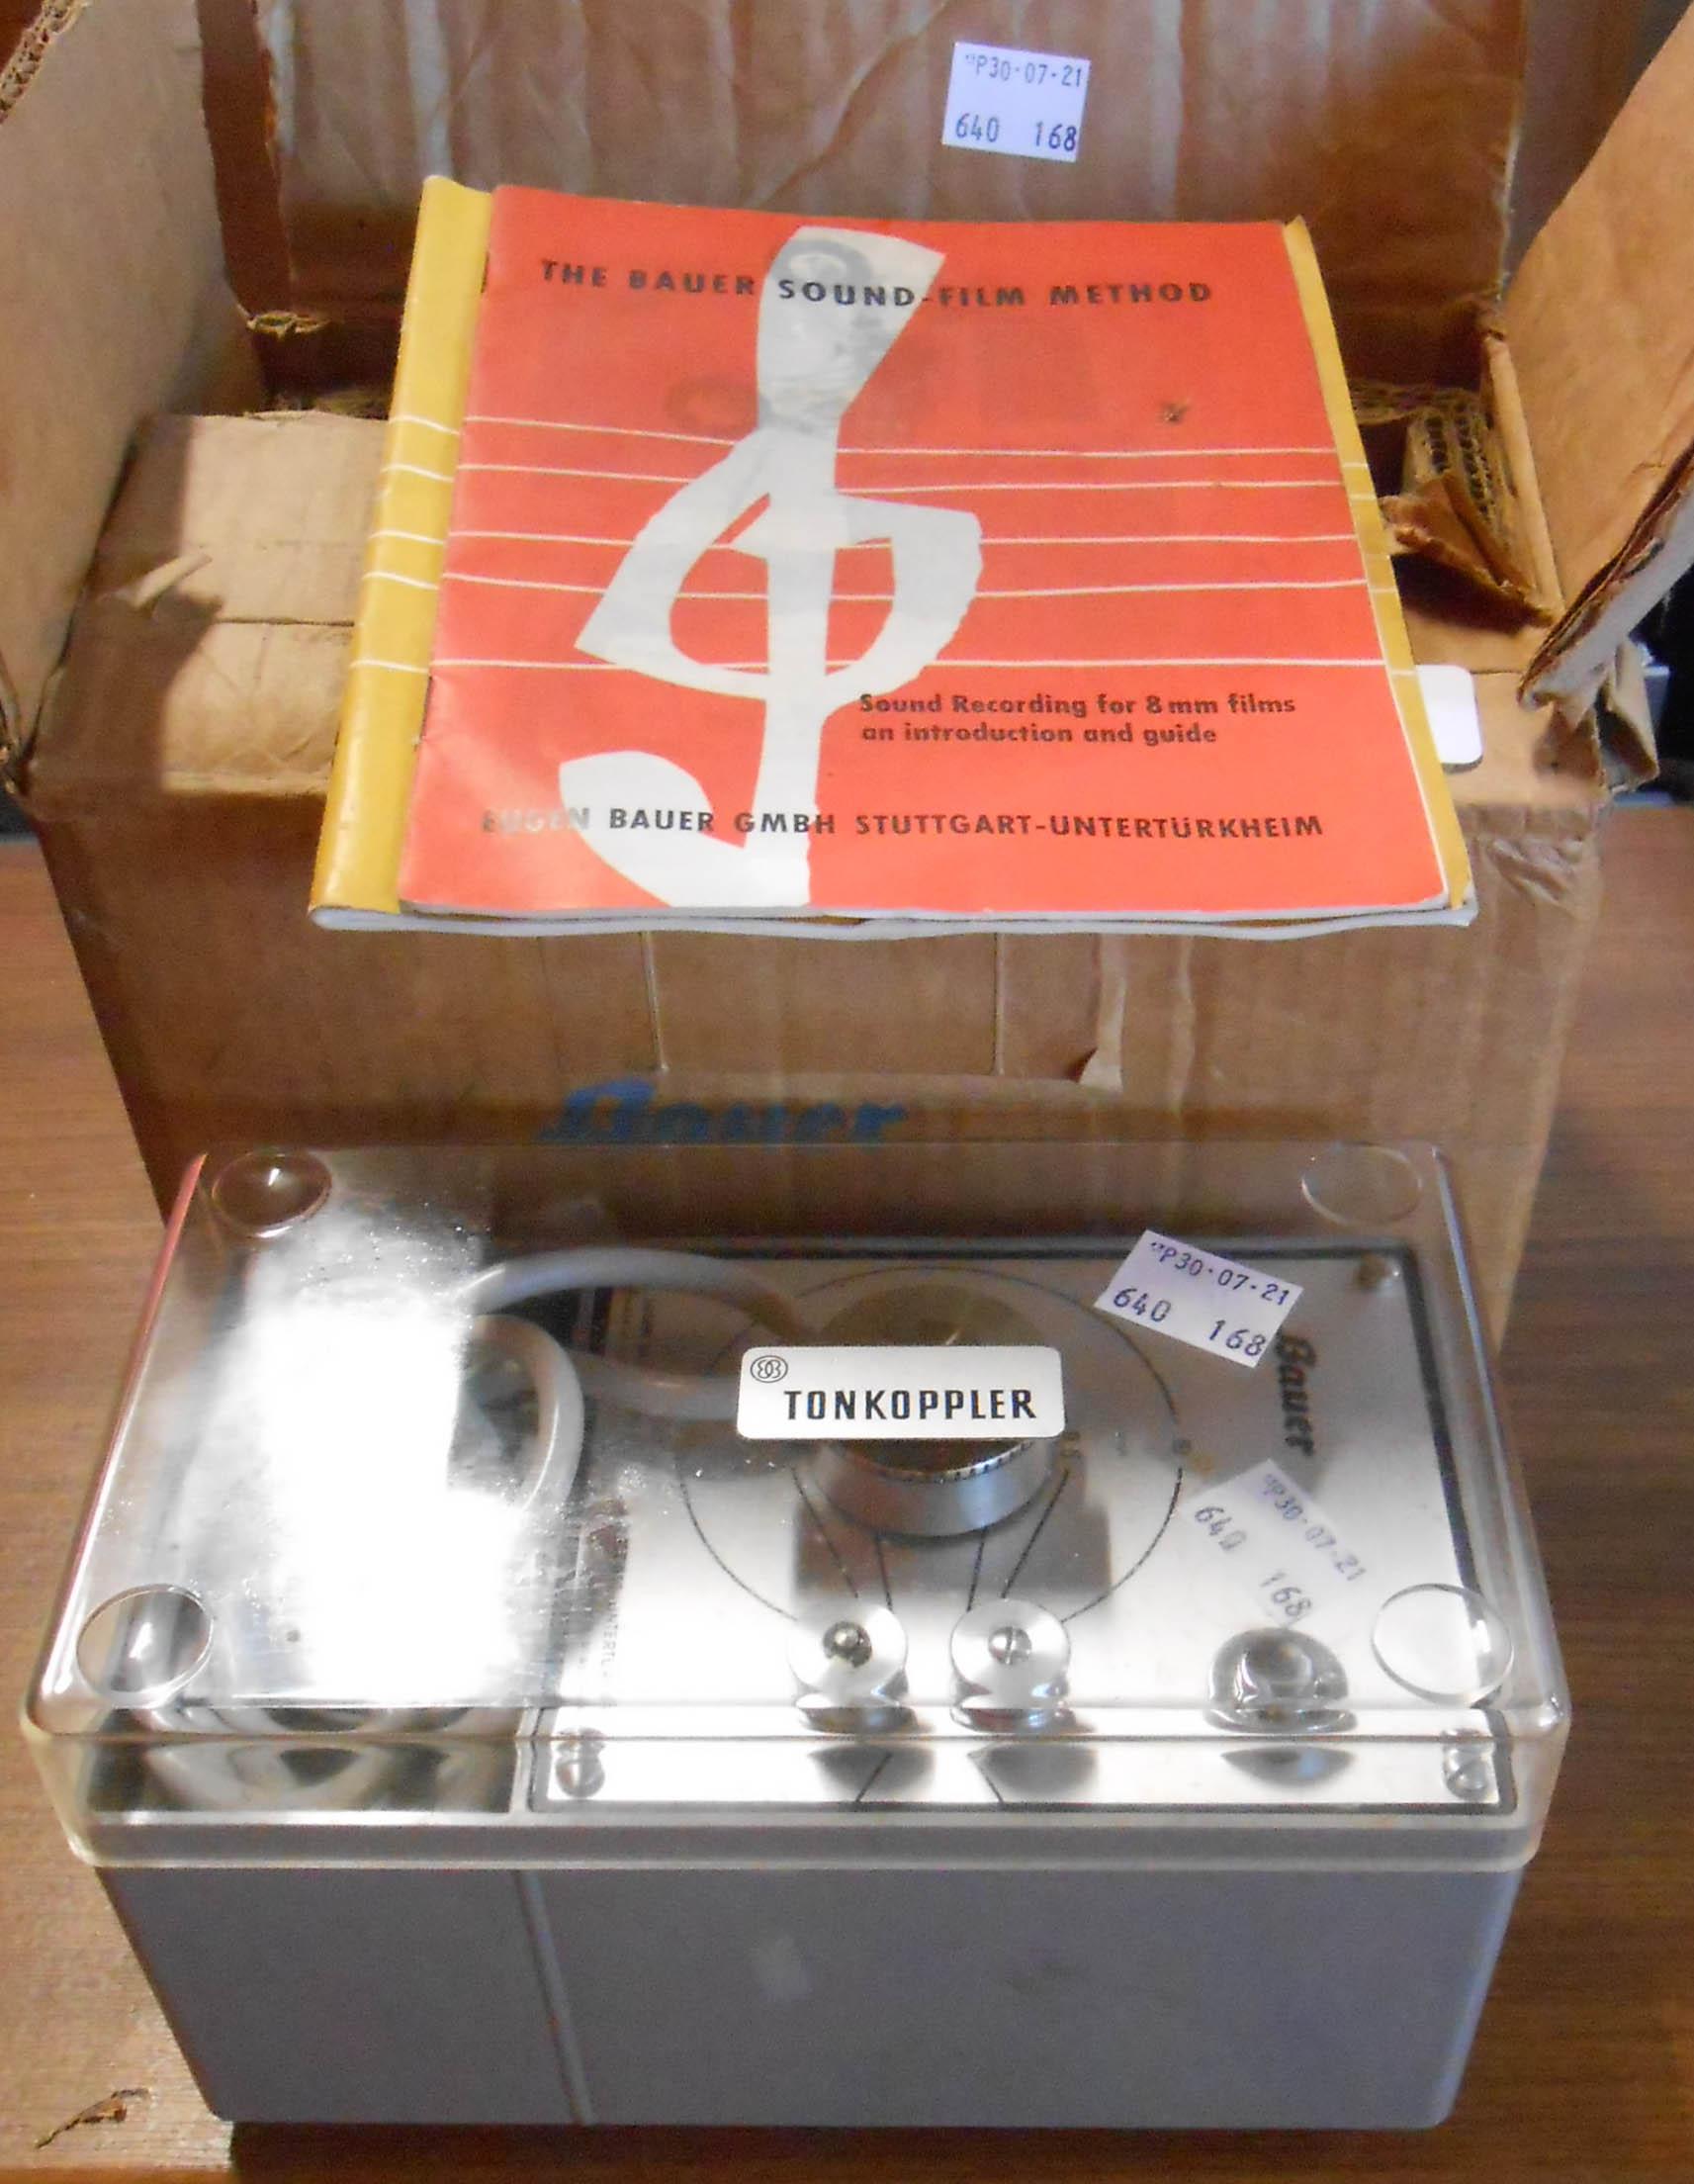 A Bauer Tonkoppler cinefilm sound coupler in original box